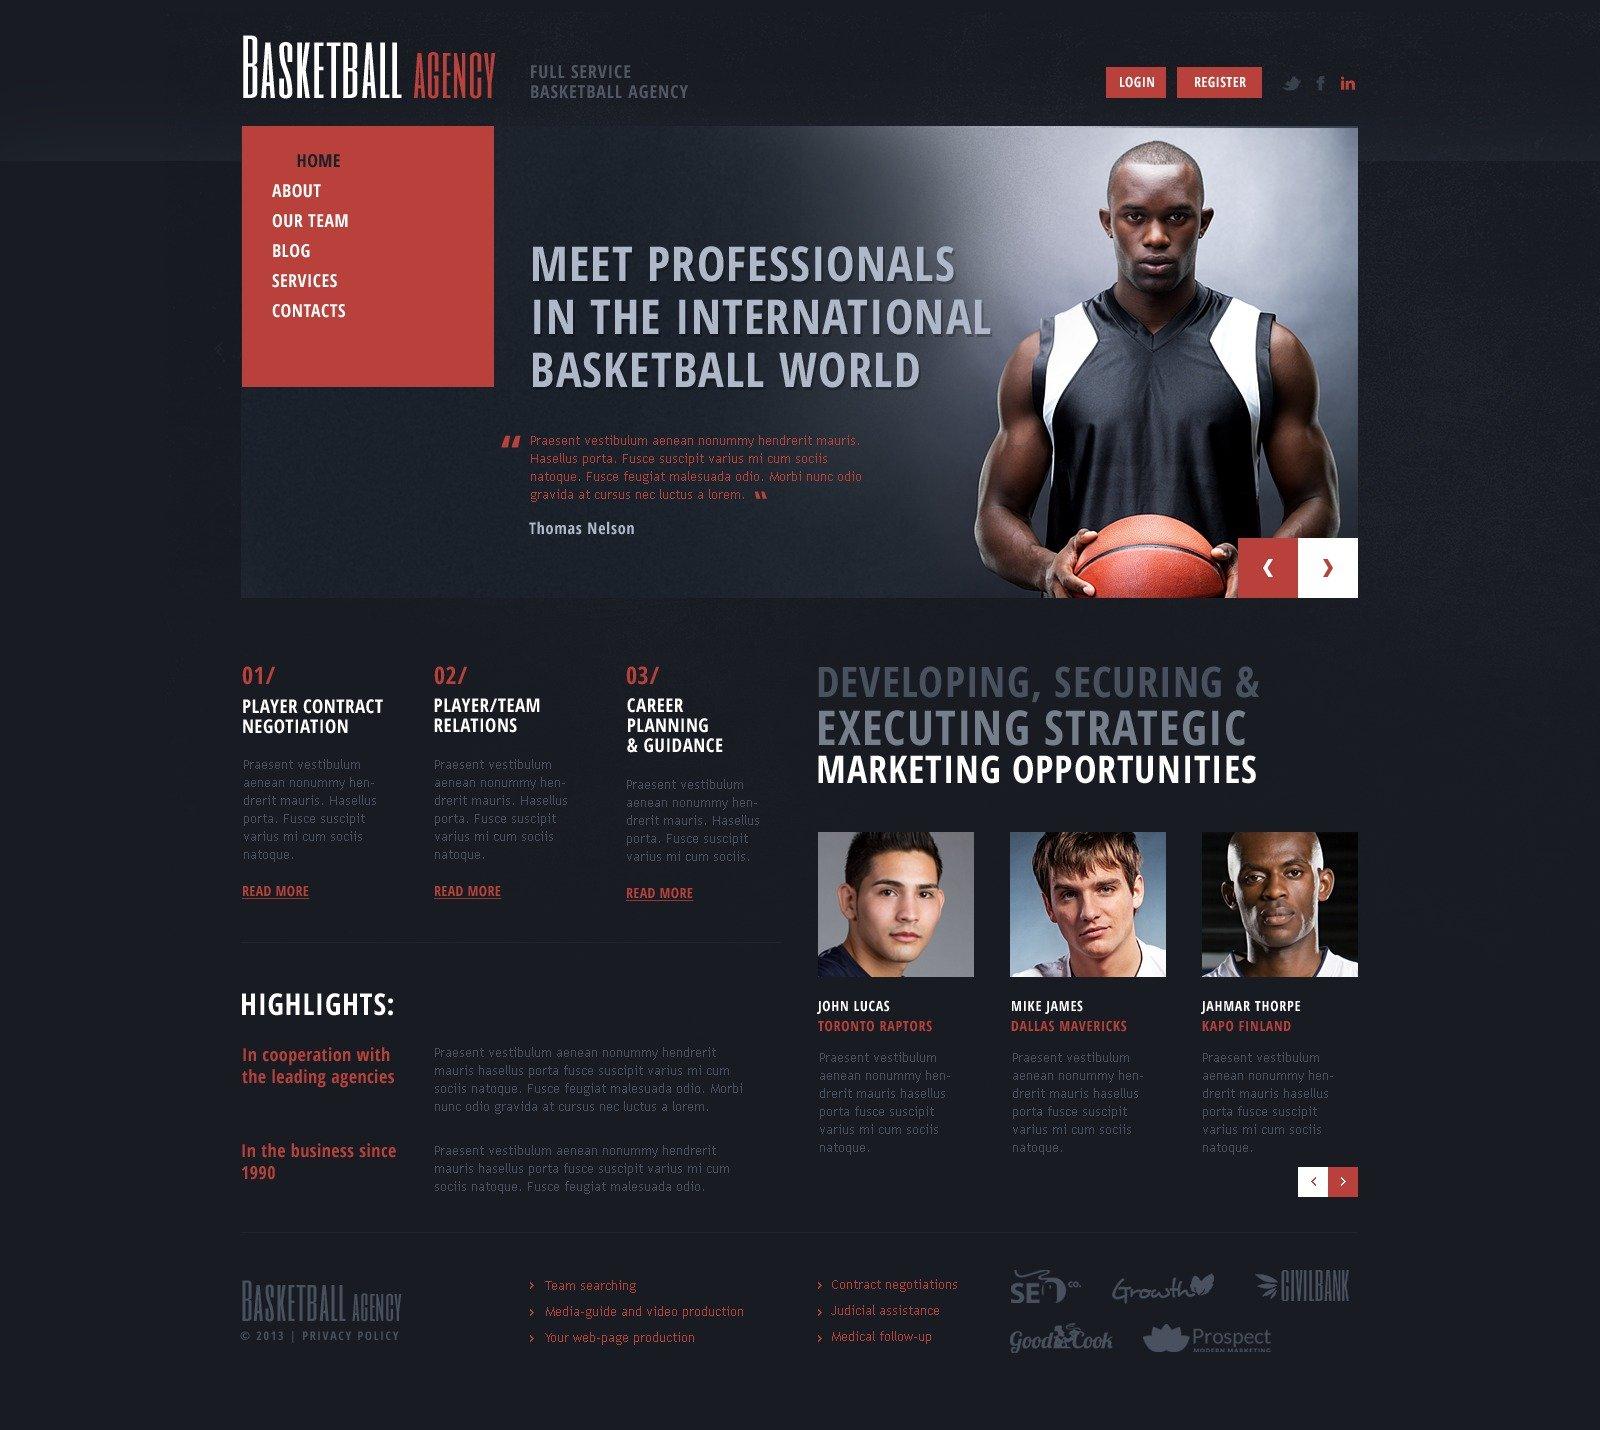 Bootstrap Joomla Template over Basketball №44591 - screenshot